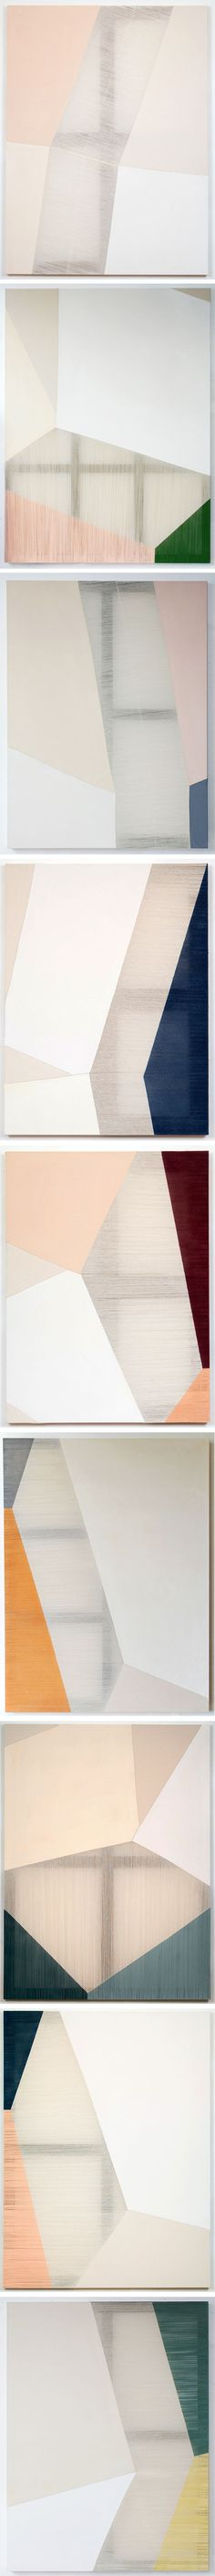 The work of Rebecca Ward | http://blog.littlepaperplanes.com/rebecca-ward/